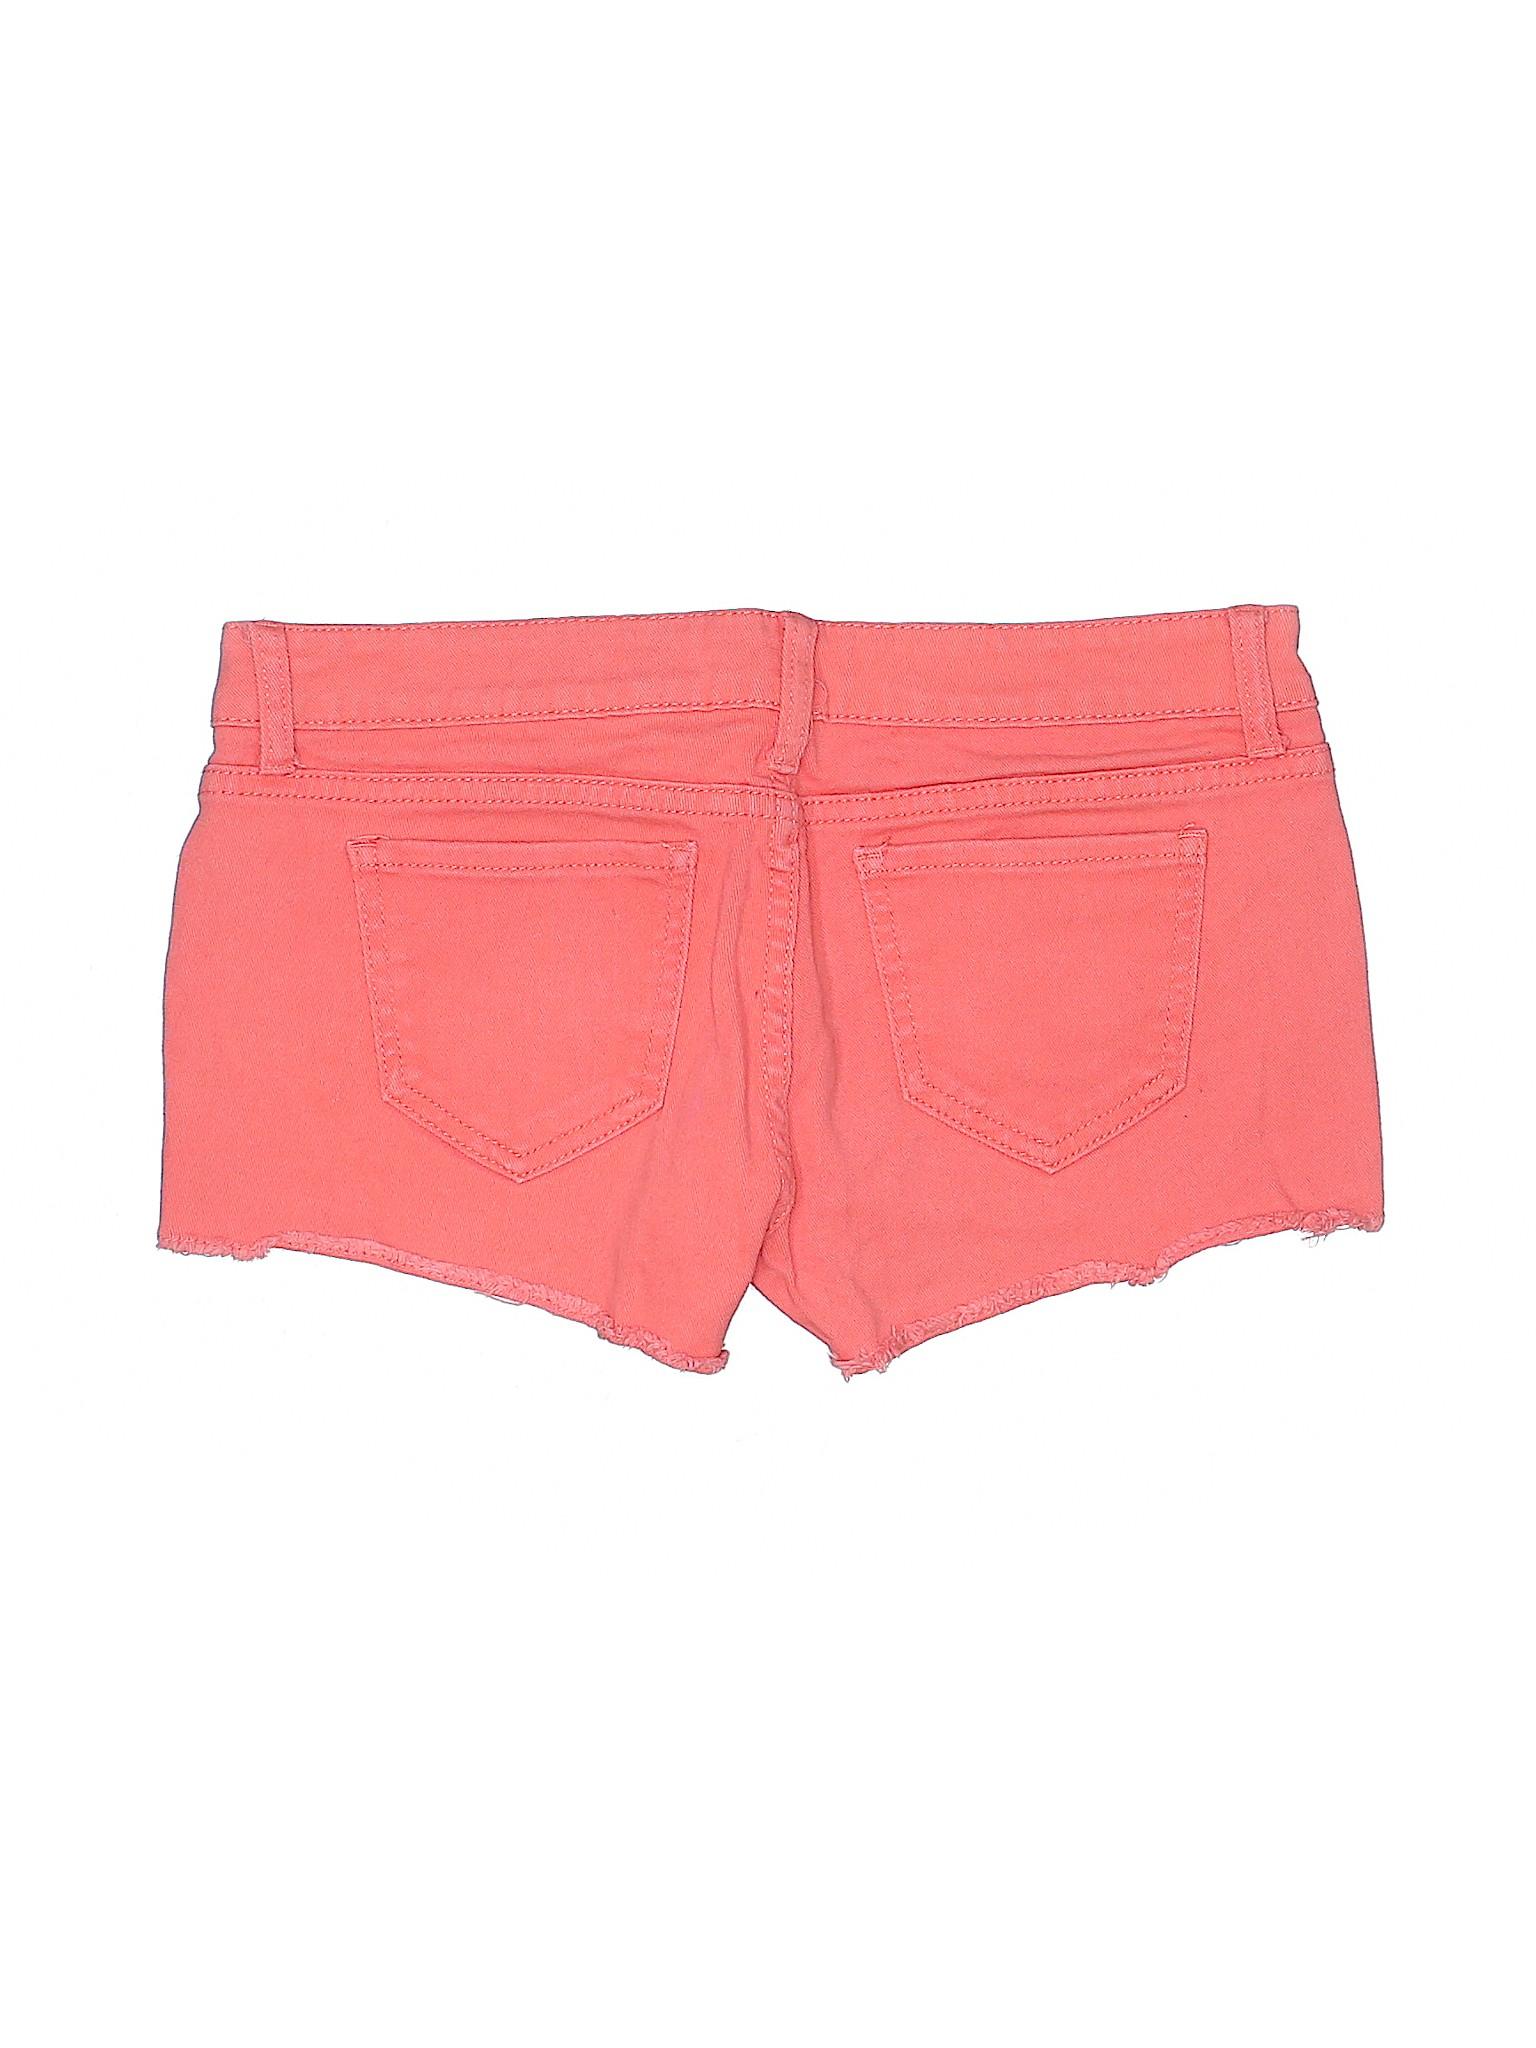 Denim Boutique Boutique Denim Shorts Refuge Denim Refuge Boutique Refuge Shorts X16BqTXZr